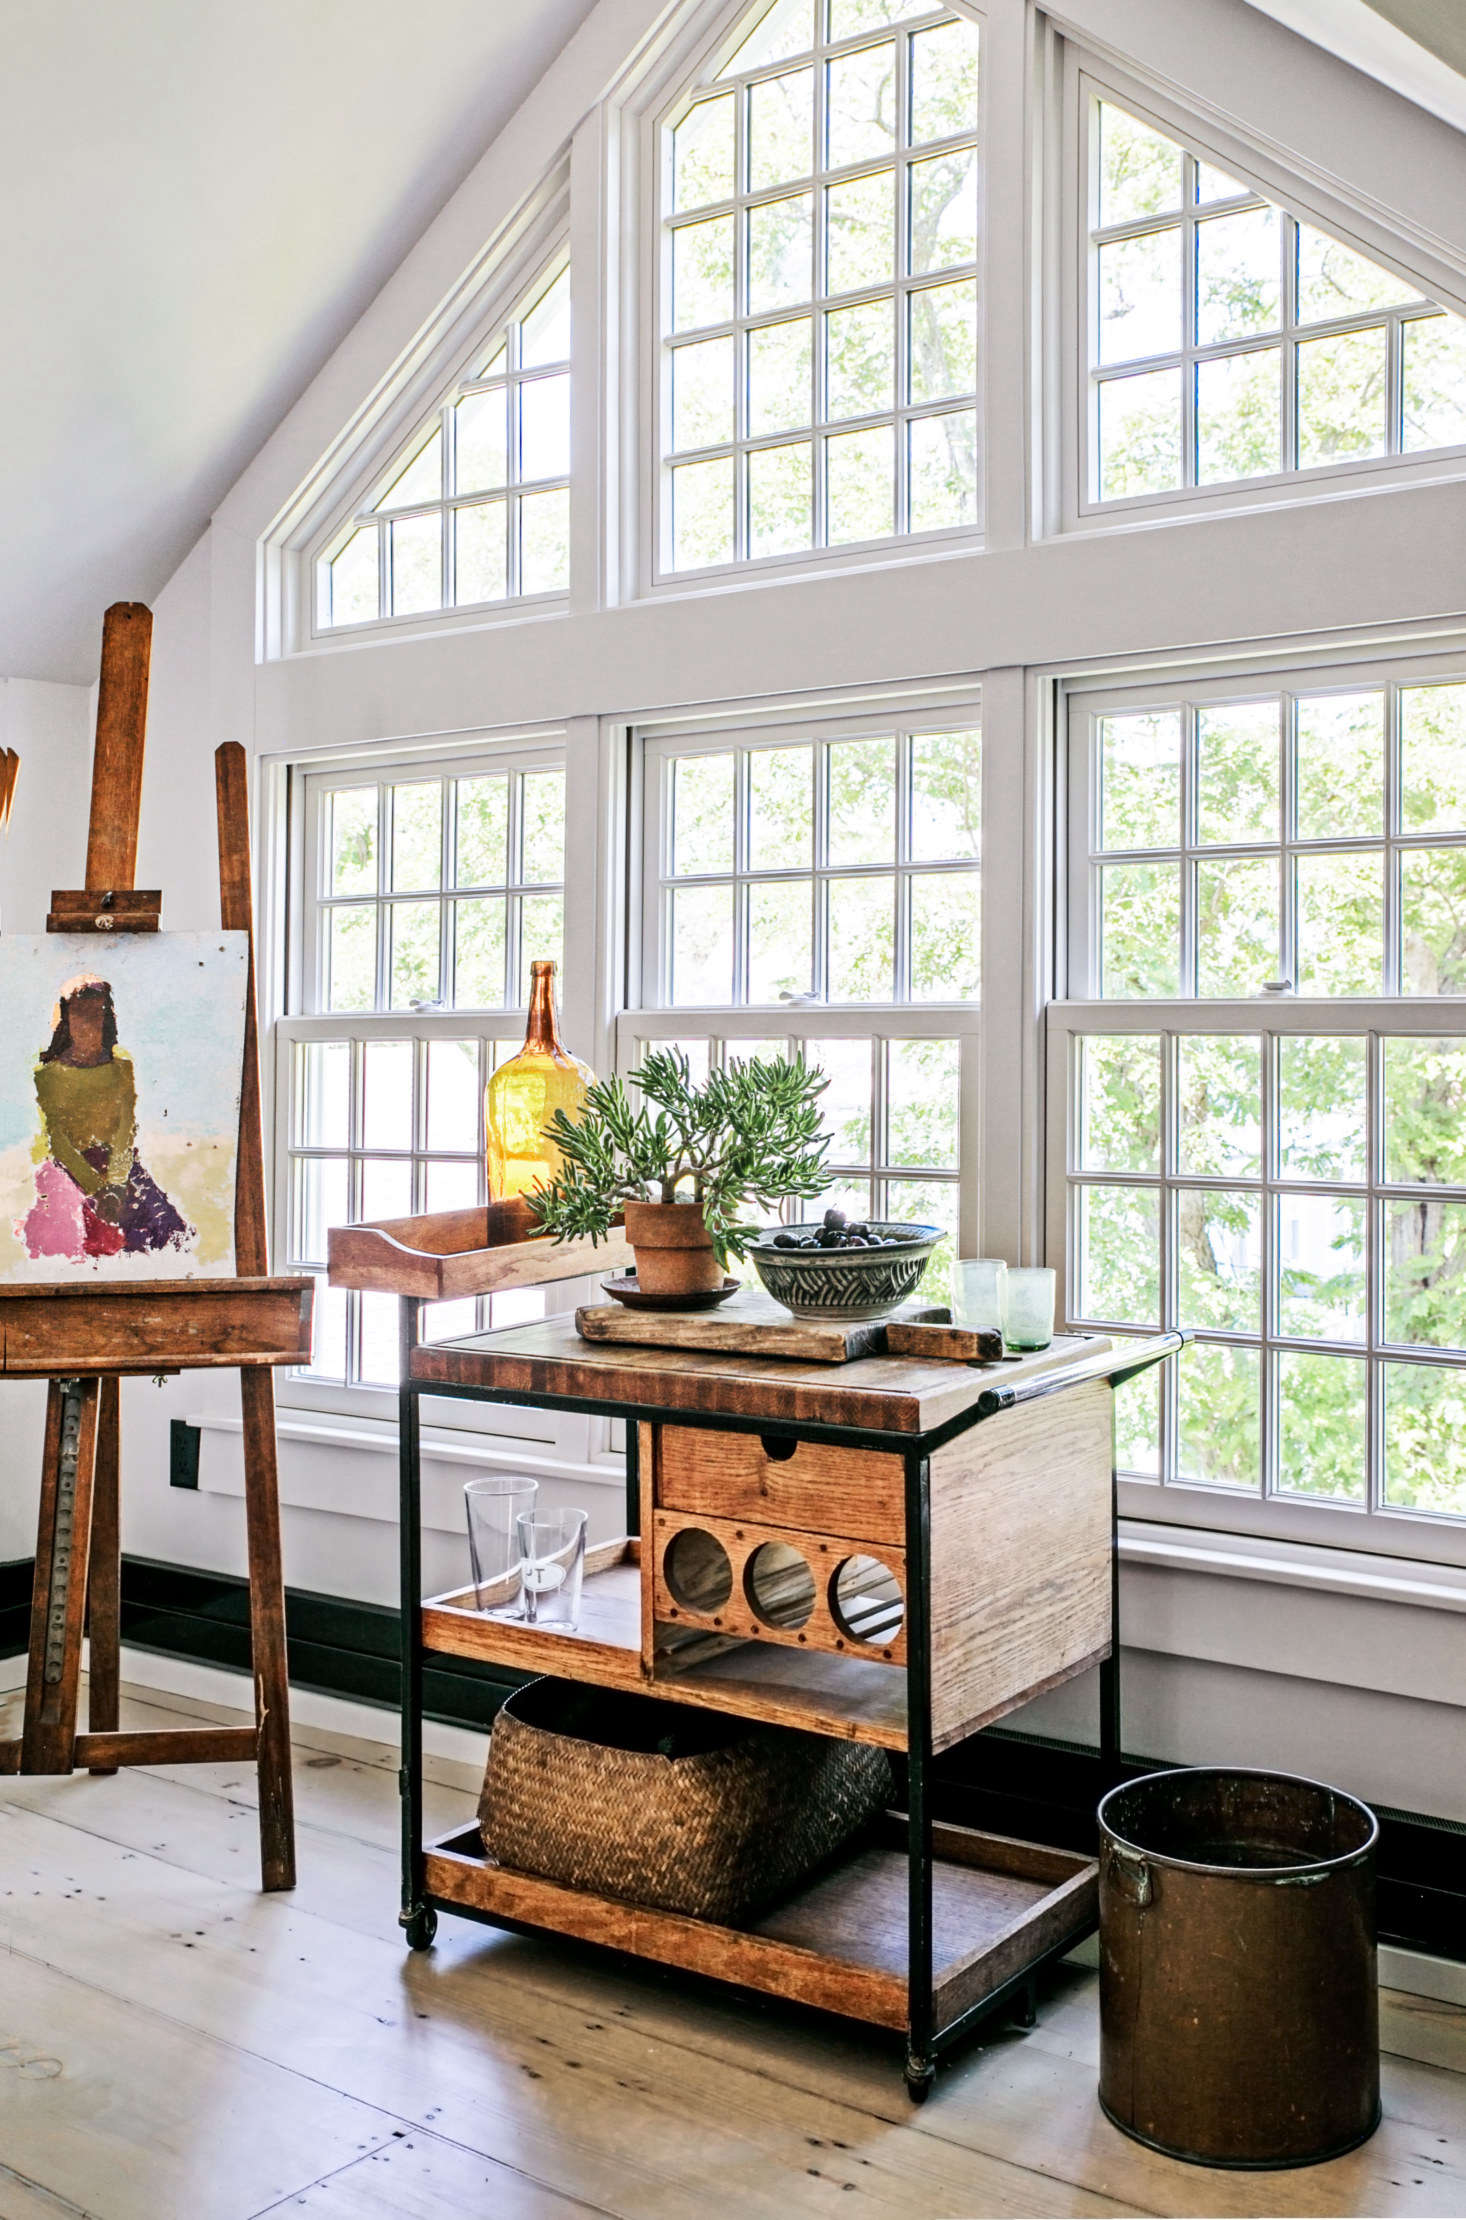 A wall of windows filters abundant daylight into the studio.